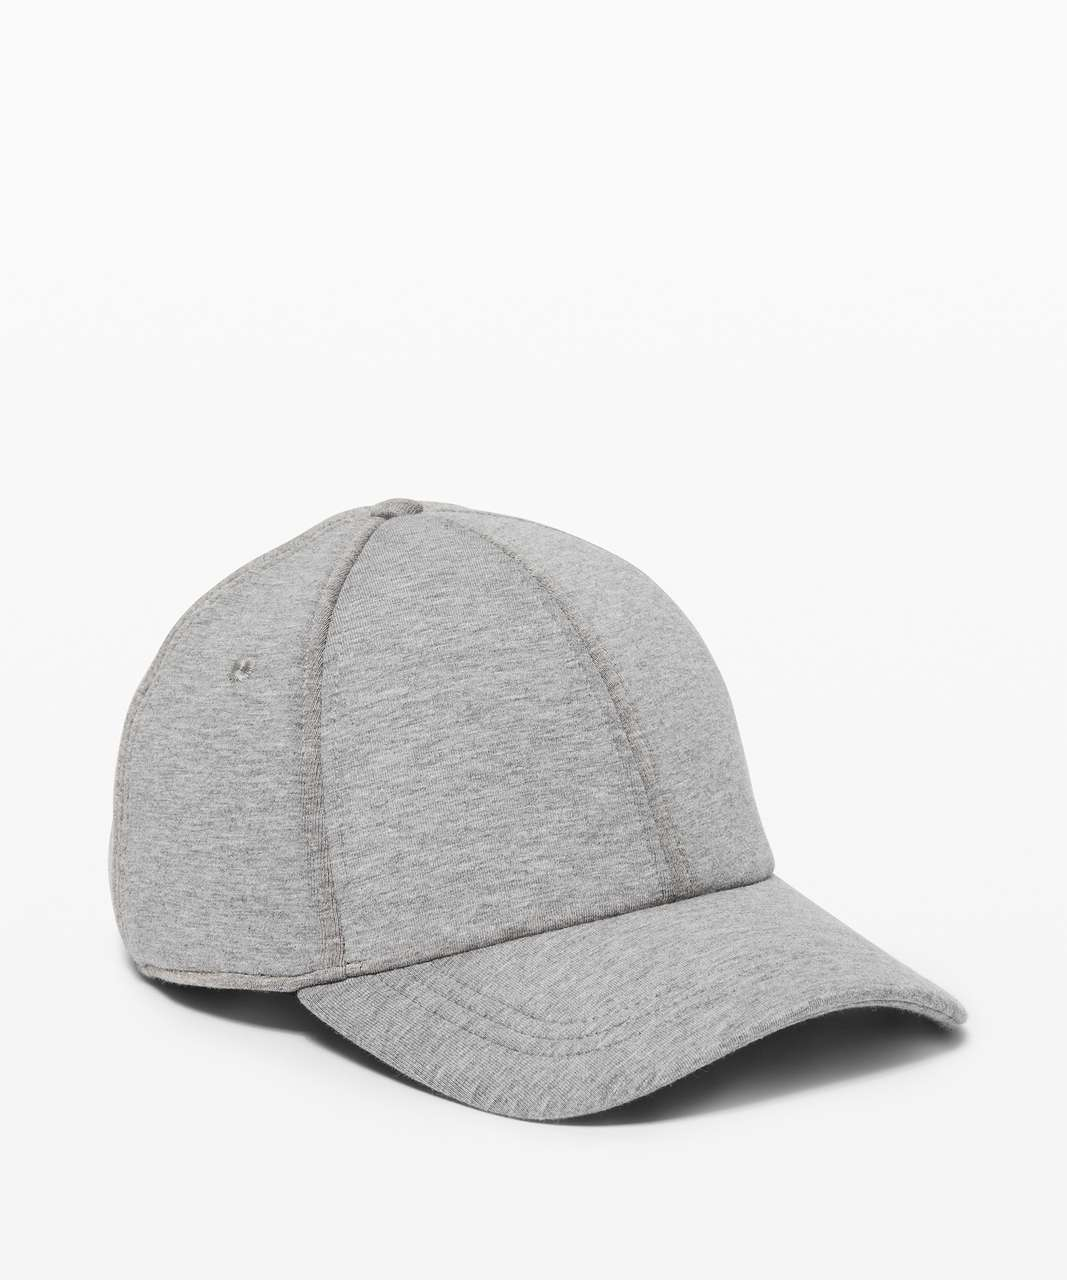 Lululemon Baller Hat - Heathered Medium Grey